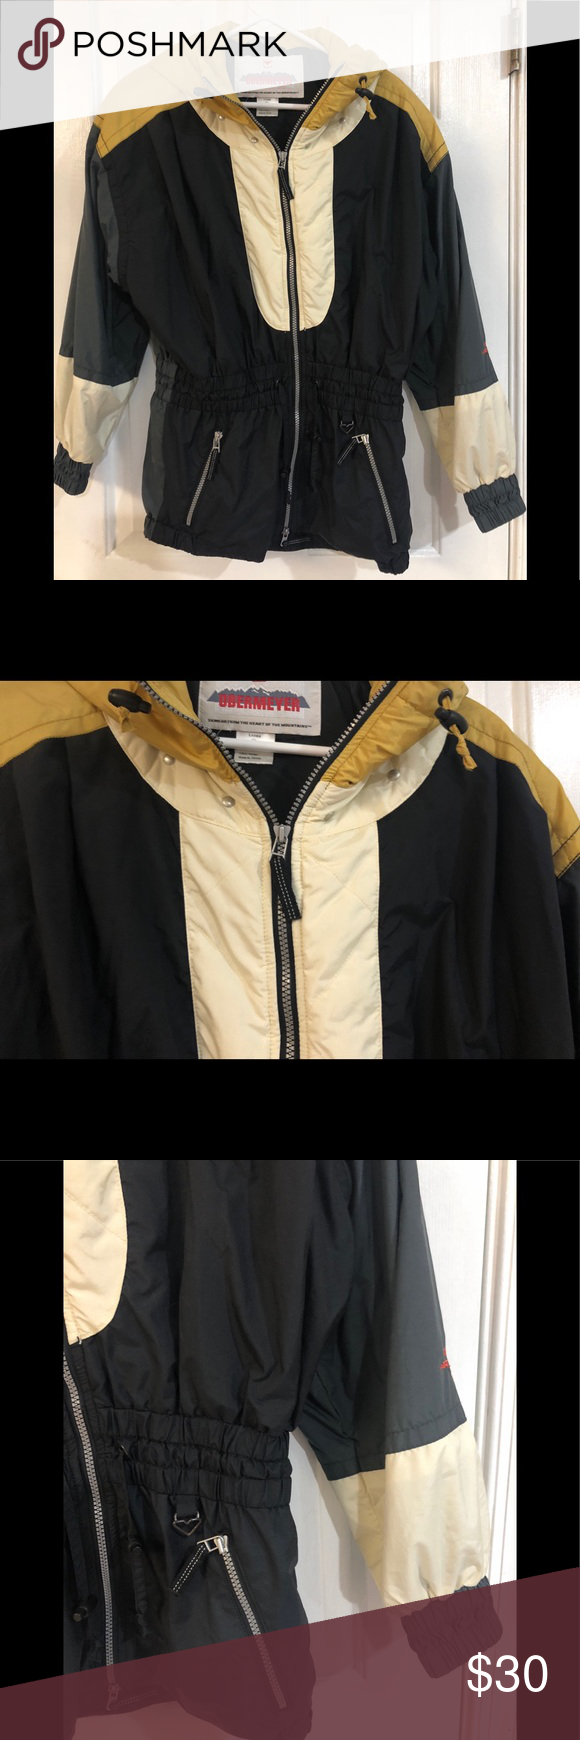 48b2e923f4 Obermeyer Womens Ski Jacket Parka Size 8 - EUC This Obermeyer Womens  Vintage ski jacket size